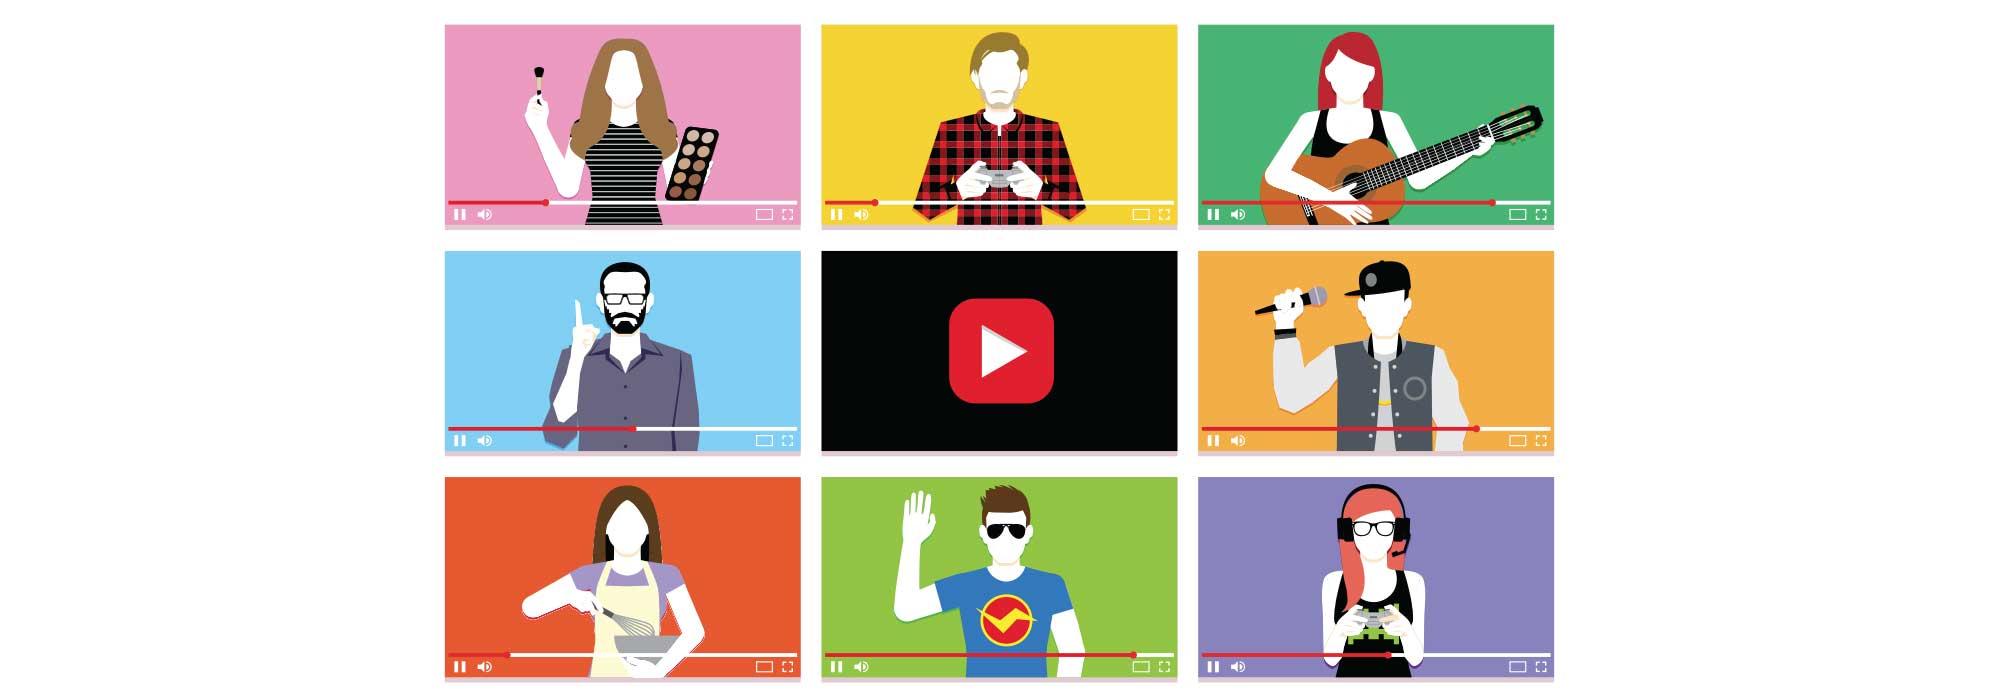 Influencer Marketing: perché funziona?